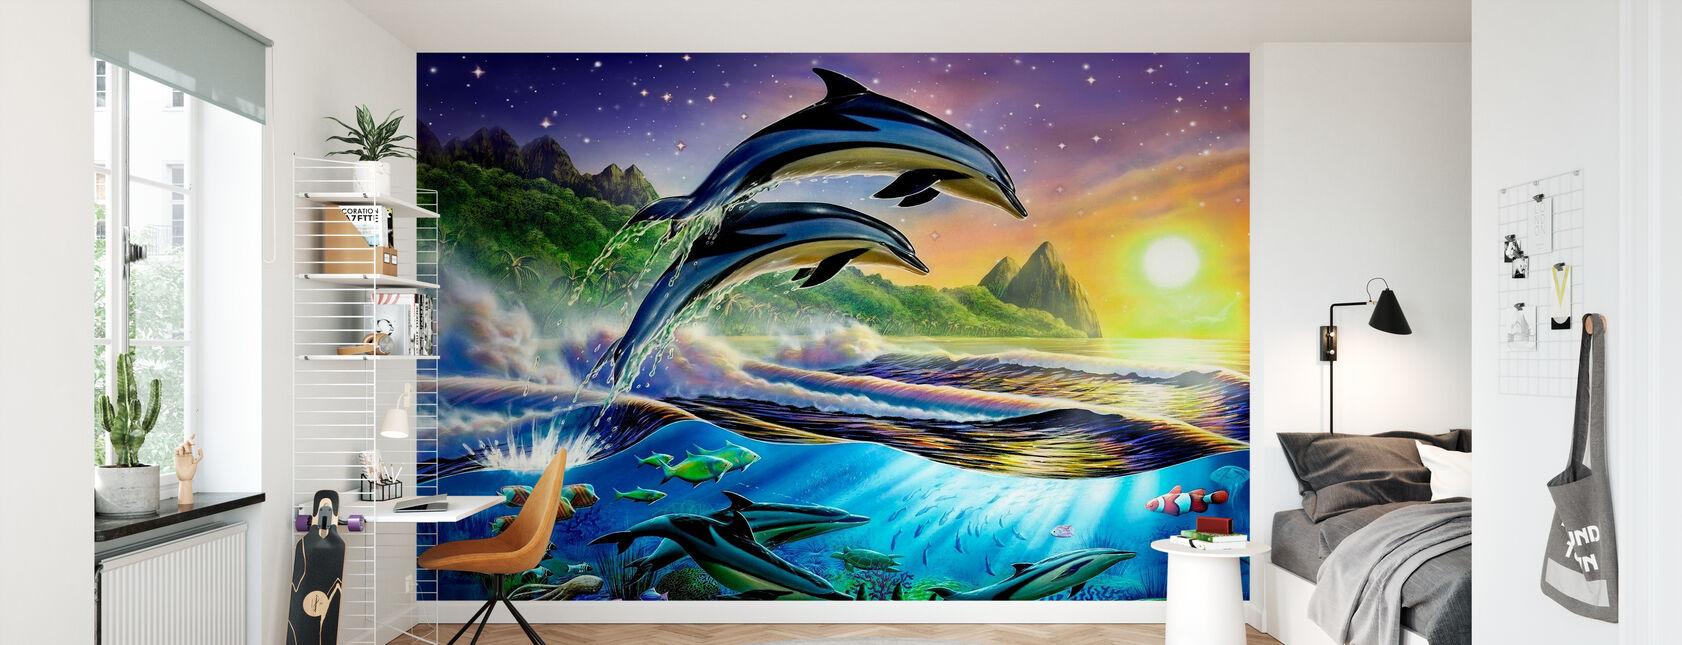 Atlantic Dolphins - Wallpaper - Kids Room